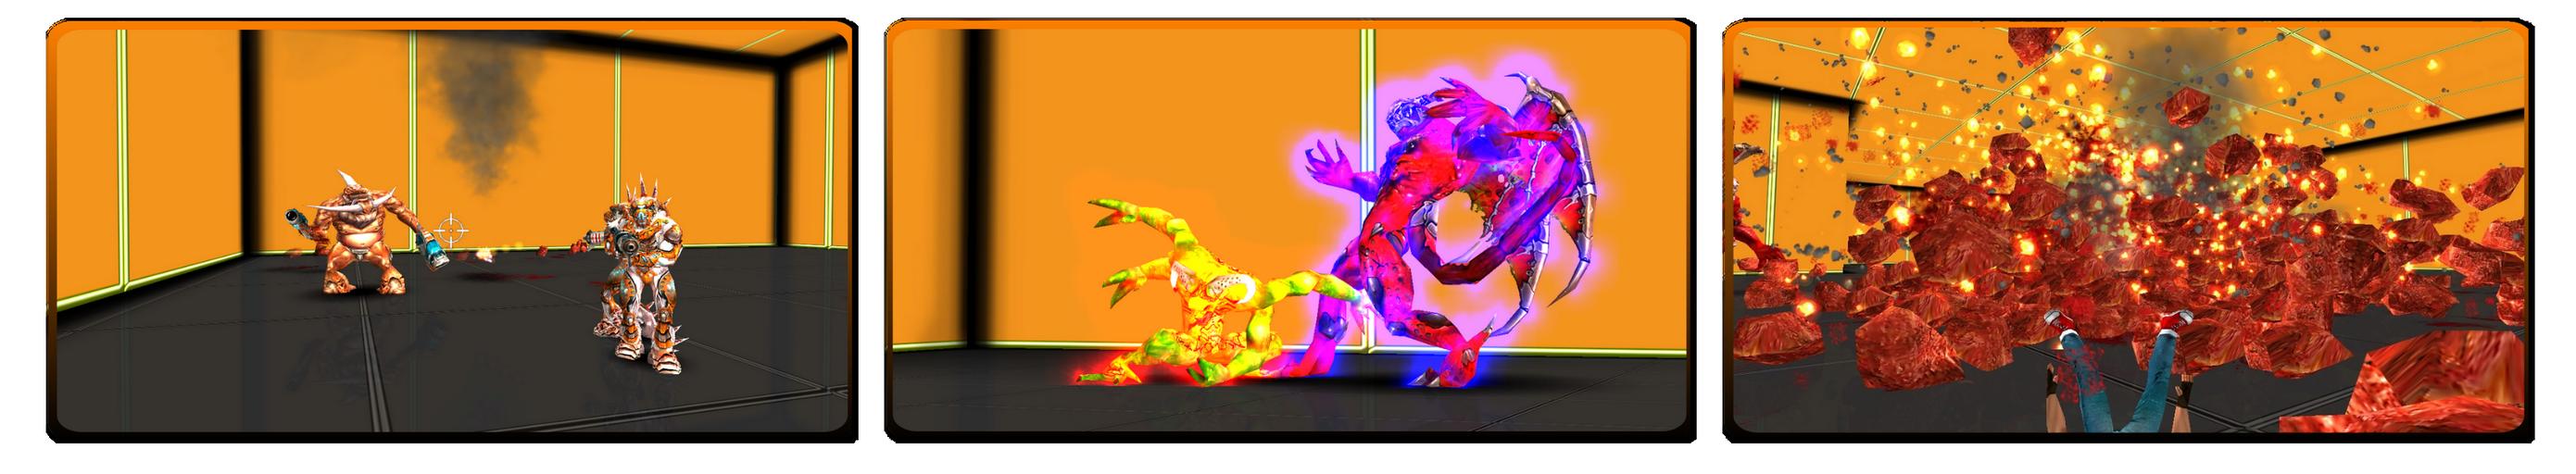 [Enemies] Advanced Monster & Item Classes Amic-pic-02